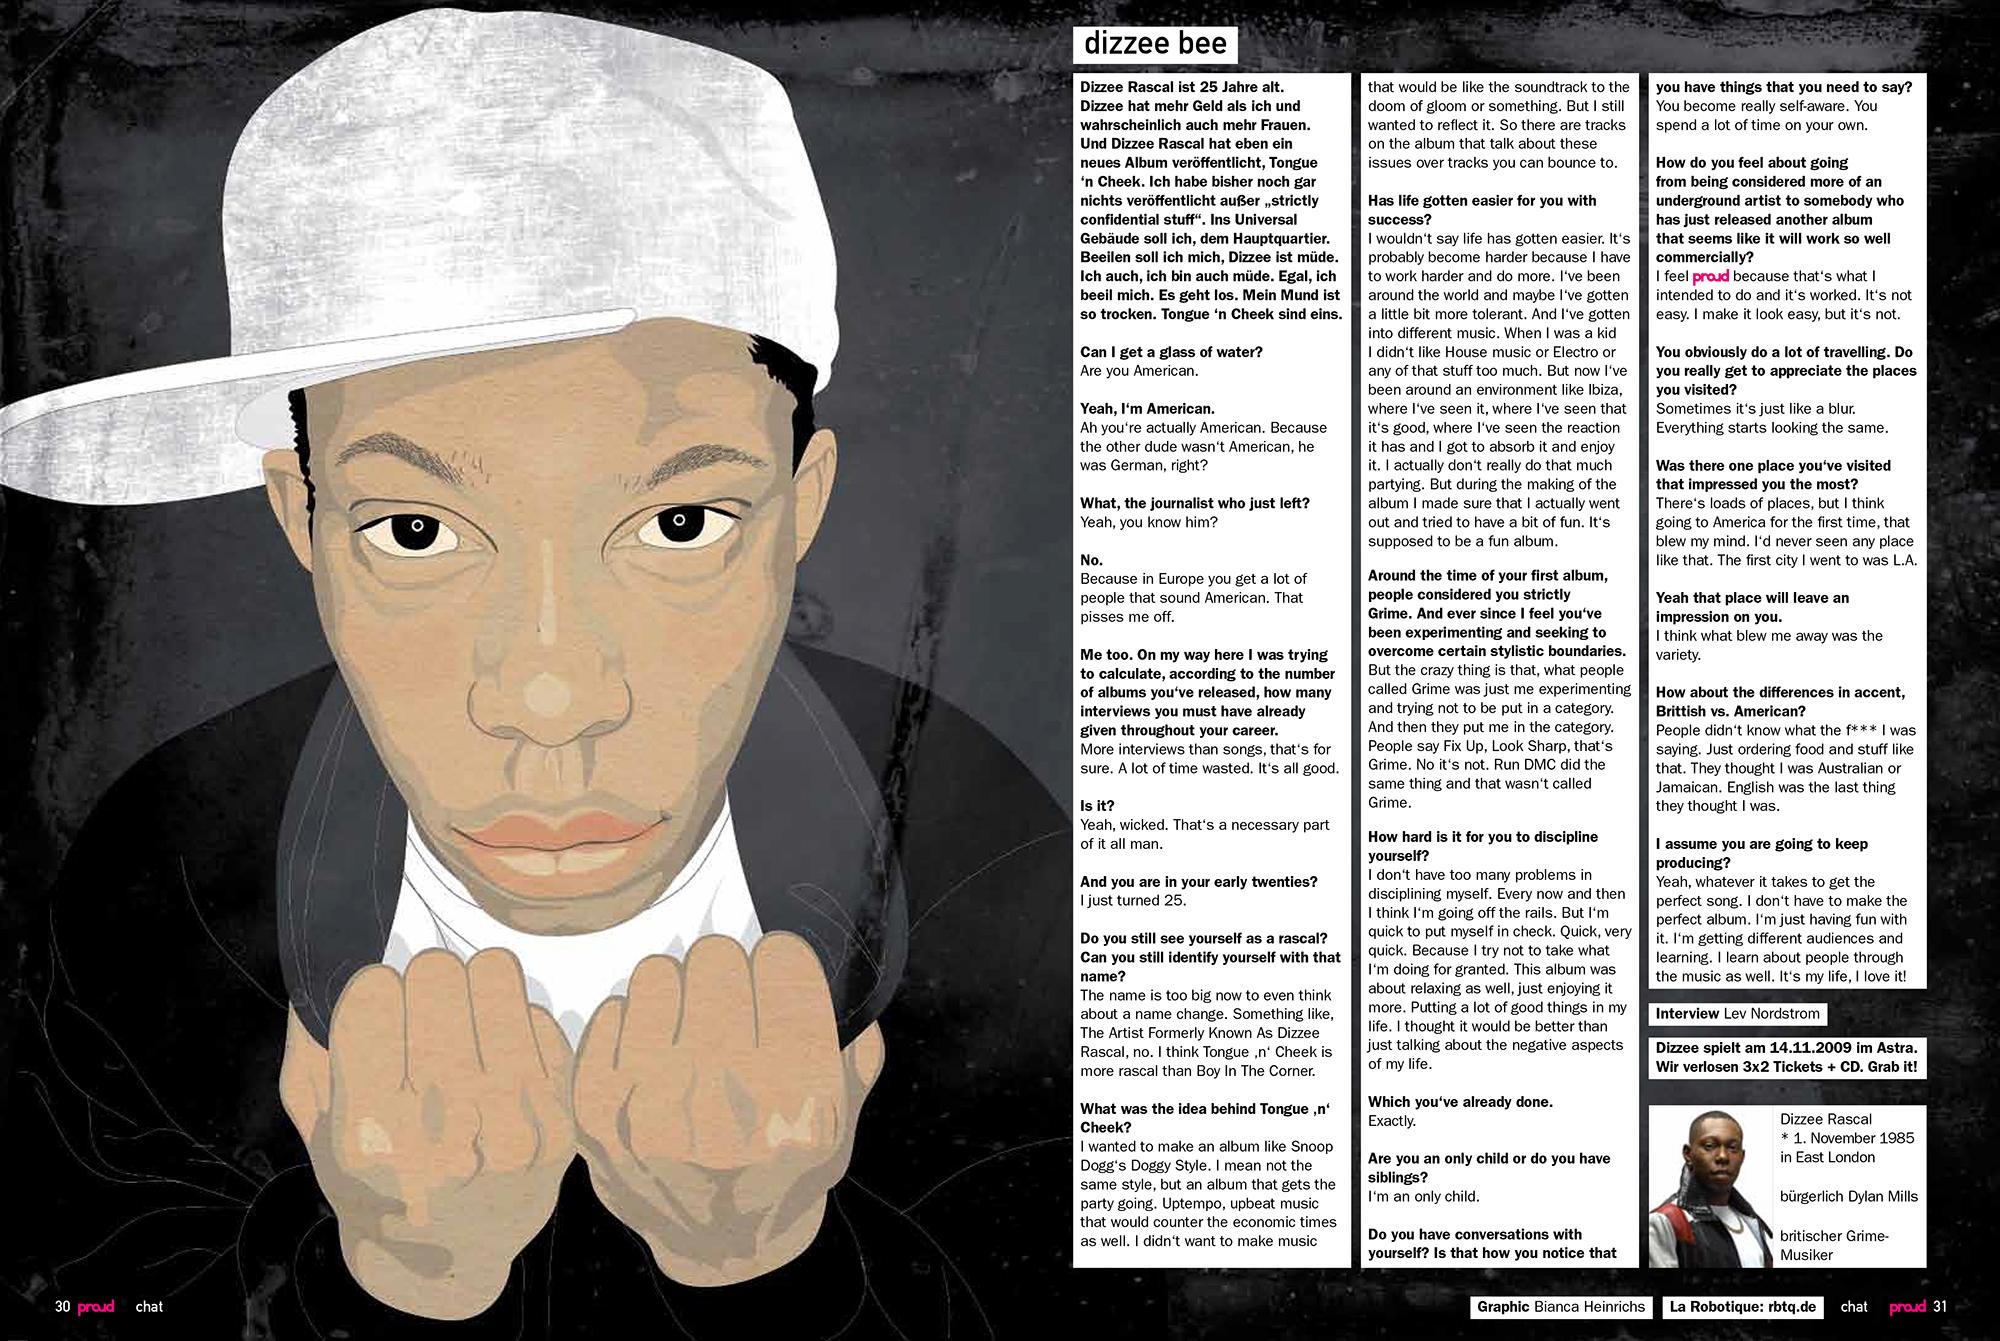 rbtq_Illustration_Seiser_Illustratorin_proud_Magazine_Editorial.jpg